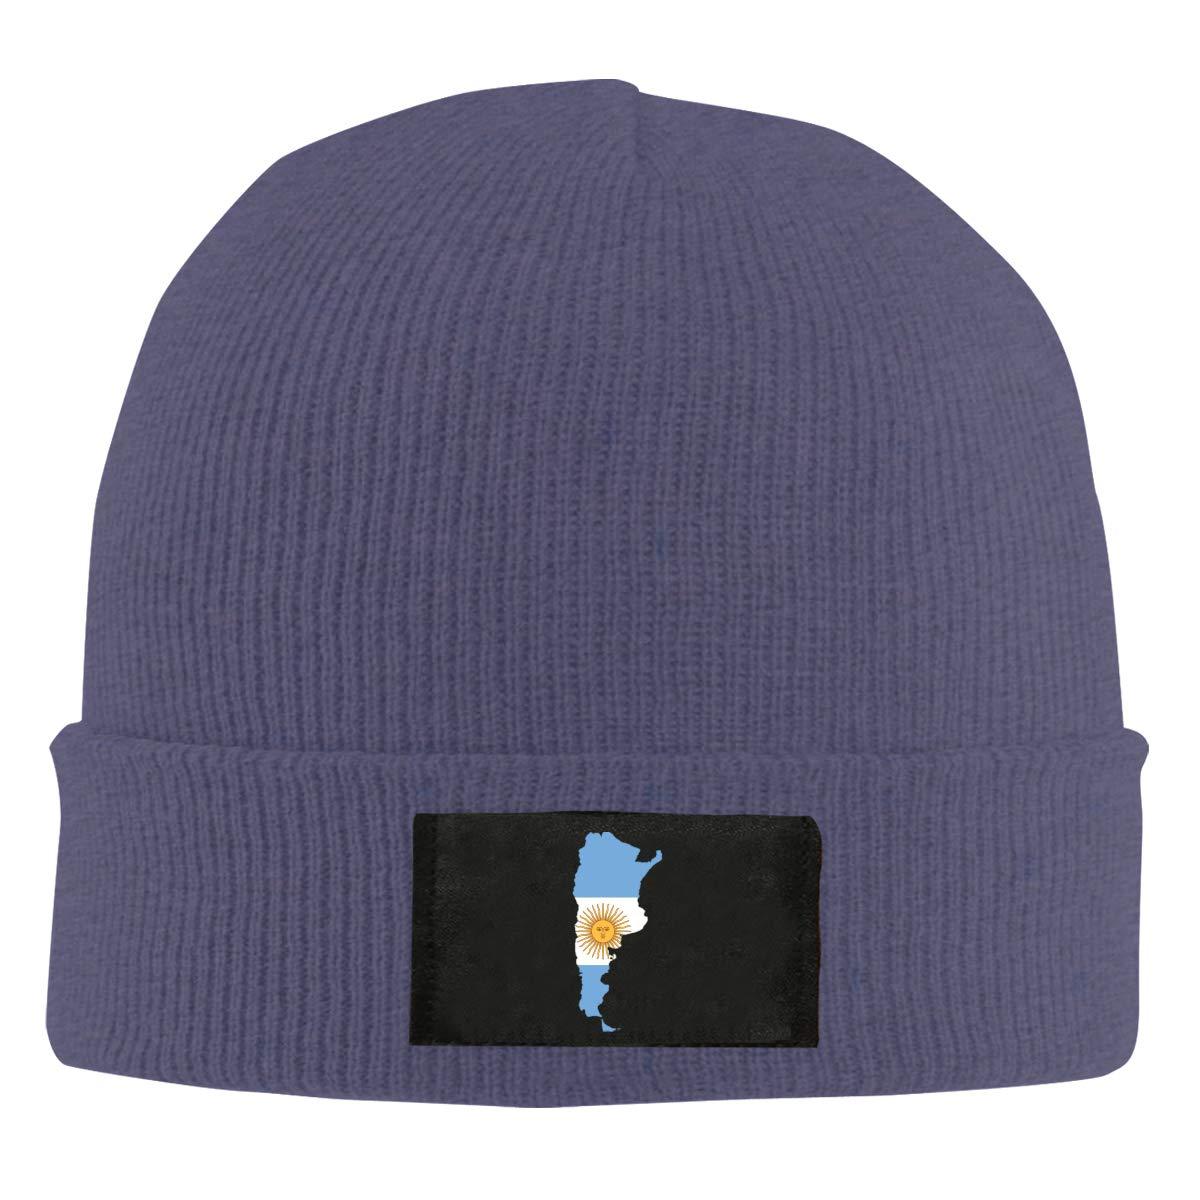 Men Women Flag Map of Argentina Skull Hat Beanie Cap Winter Knit Hat Cap